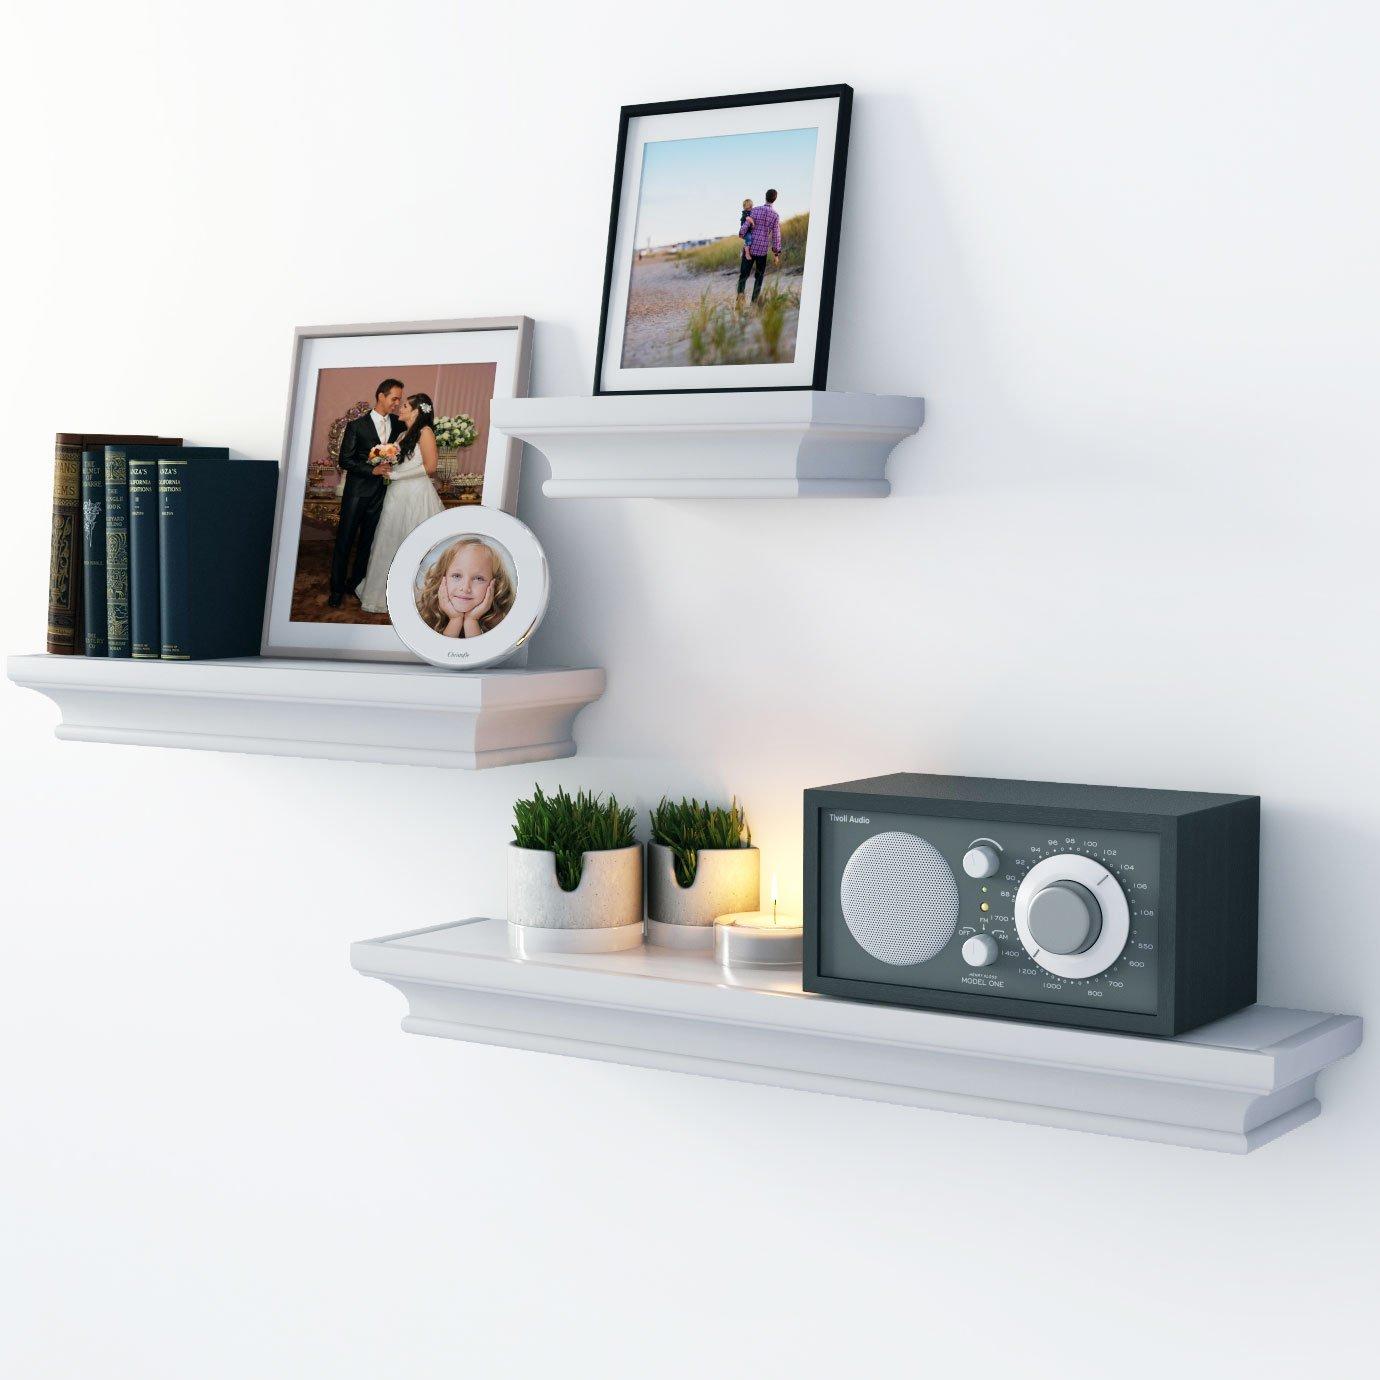 Amazon.com: Traditional Wall Shelf Ledge Set Crown Molding Design ...